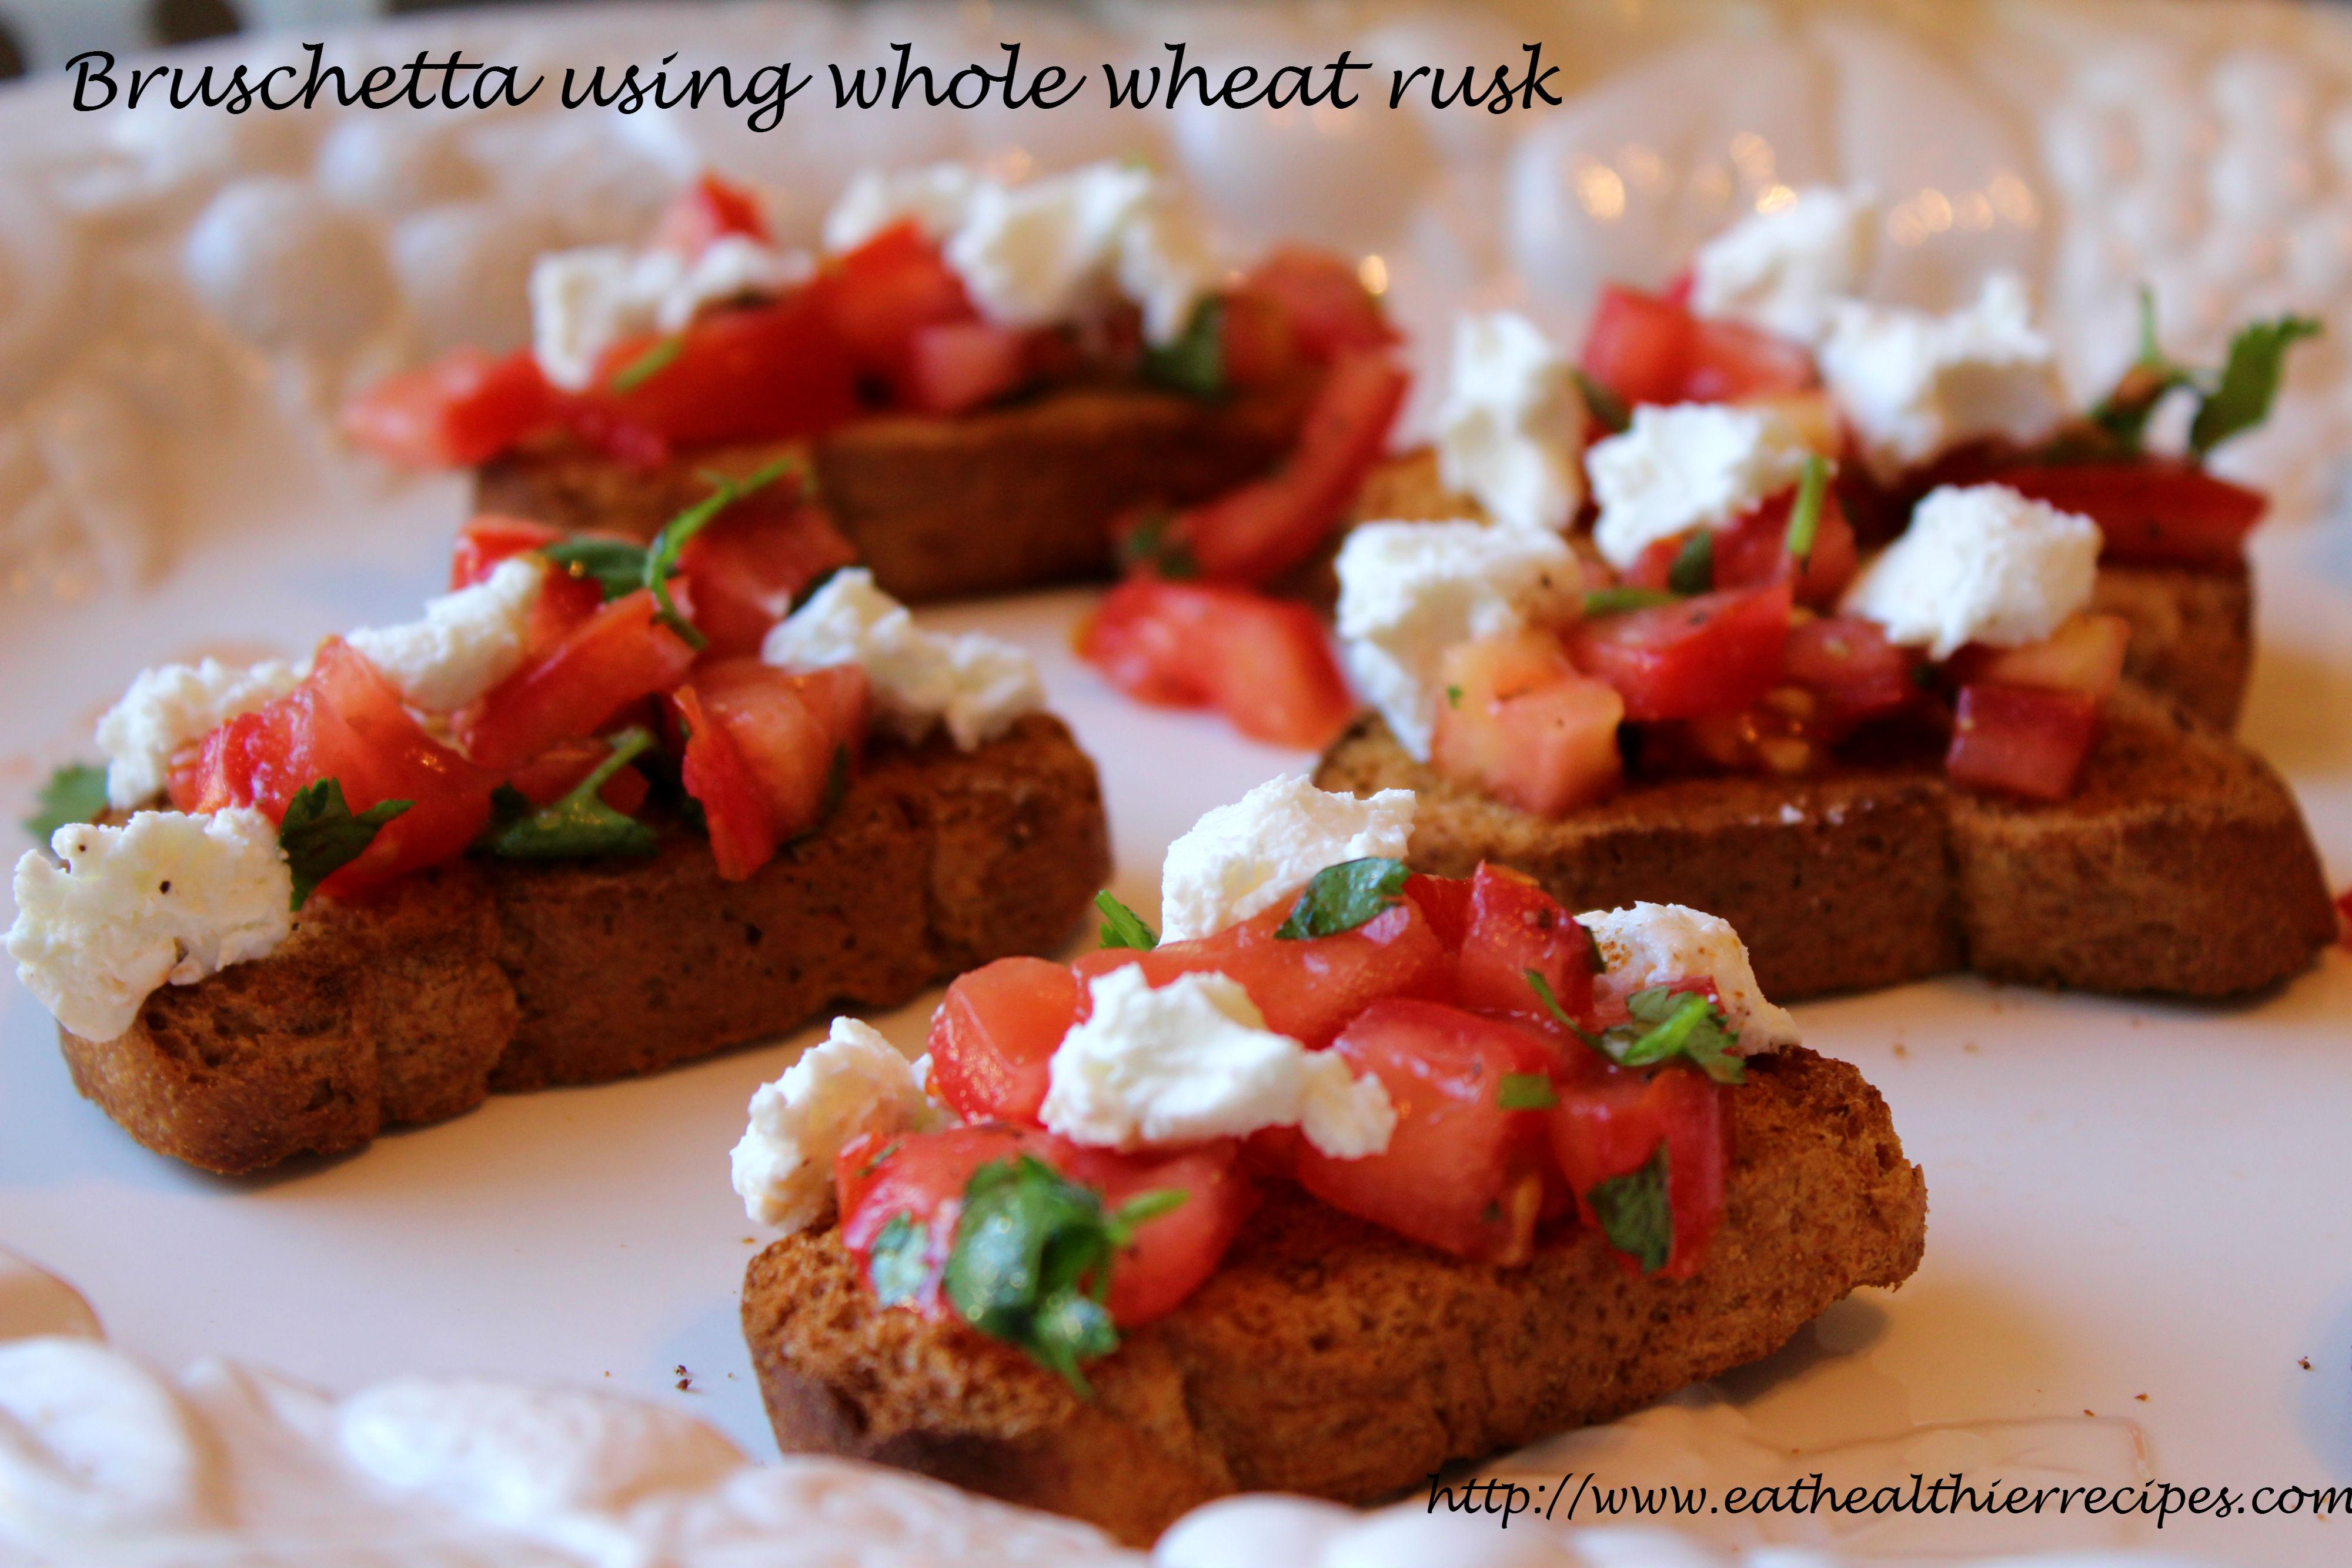 Bruschetta Using Whole Wheat Rusk